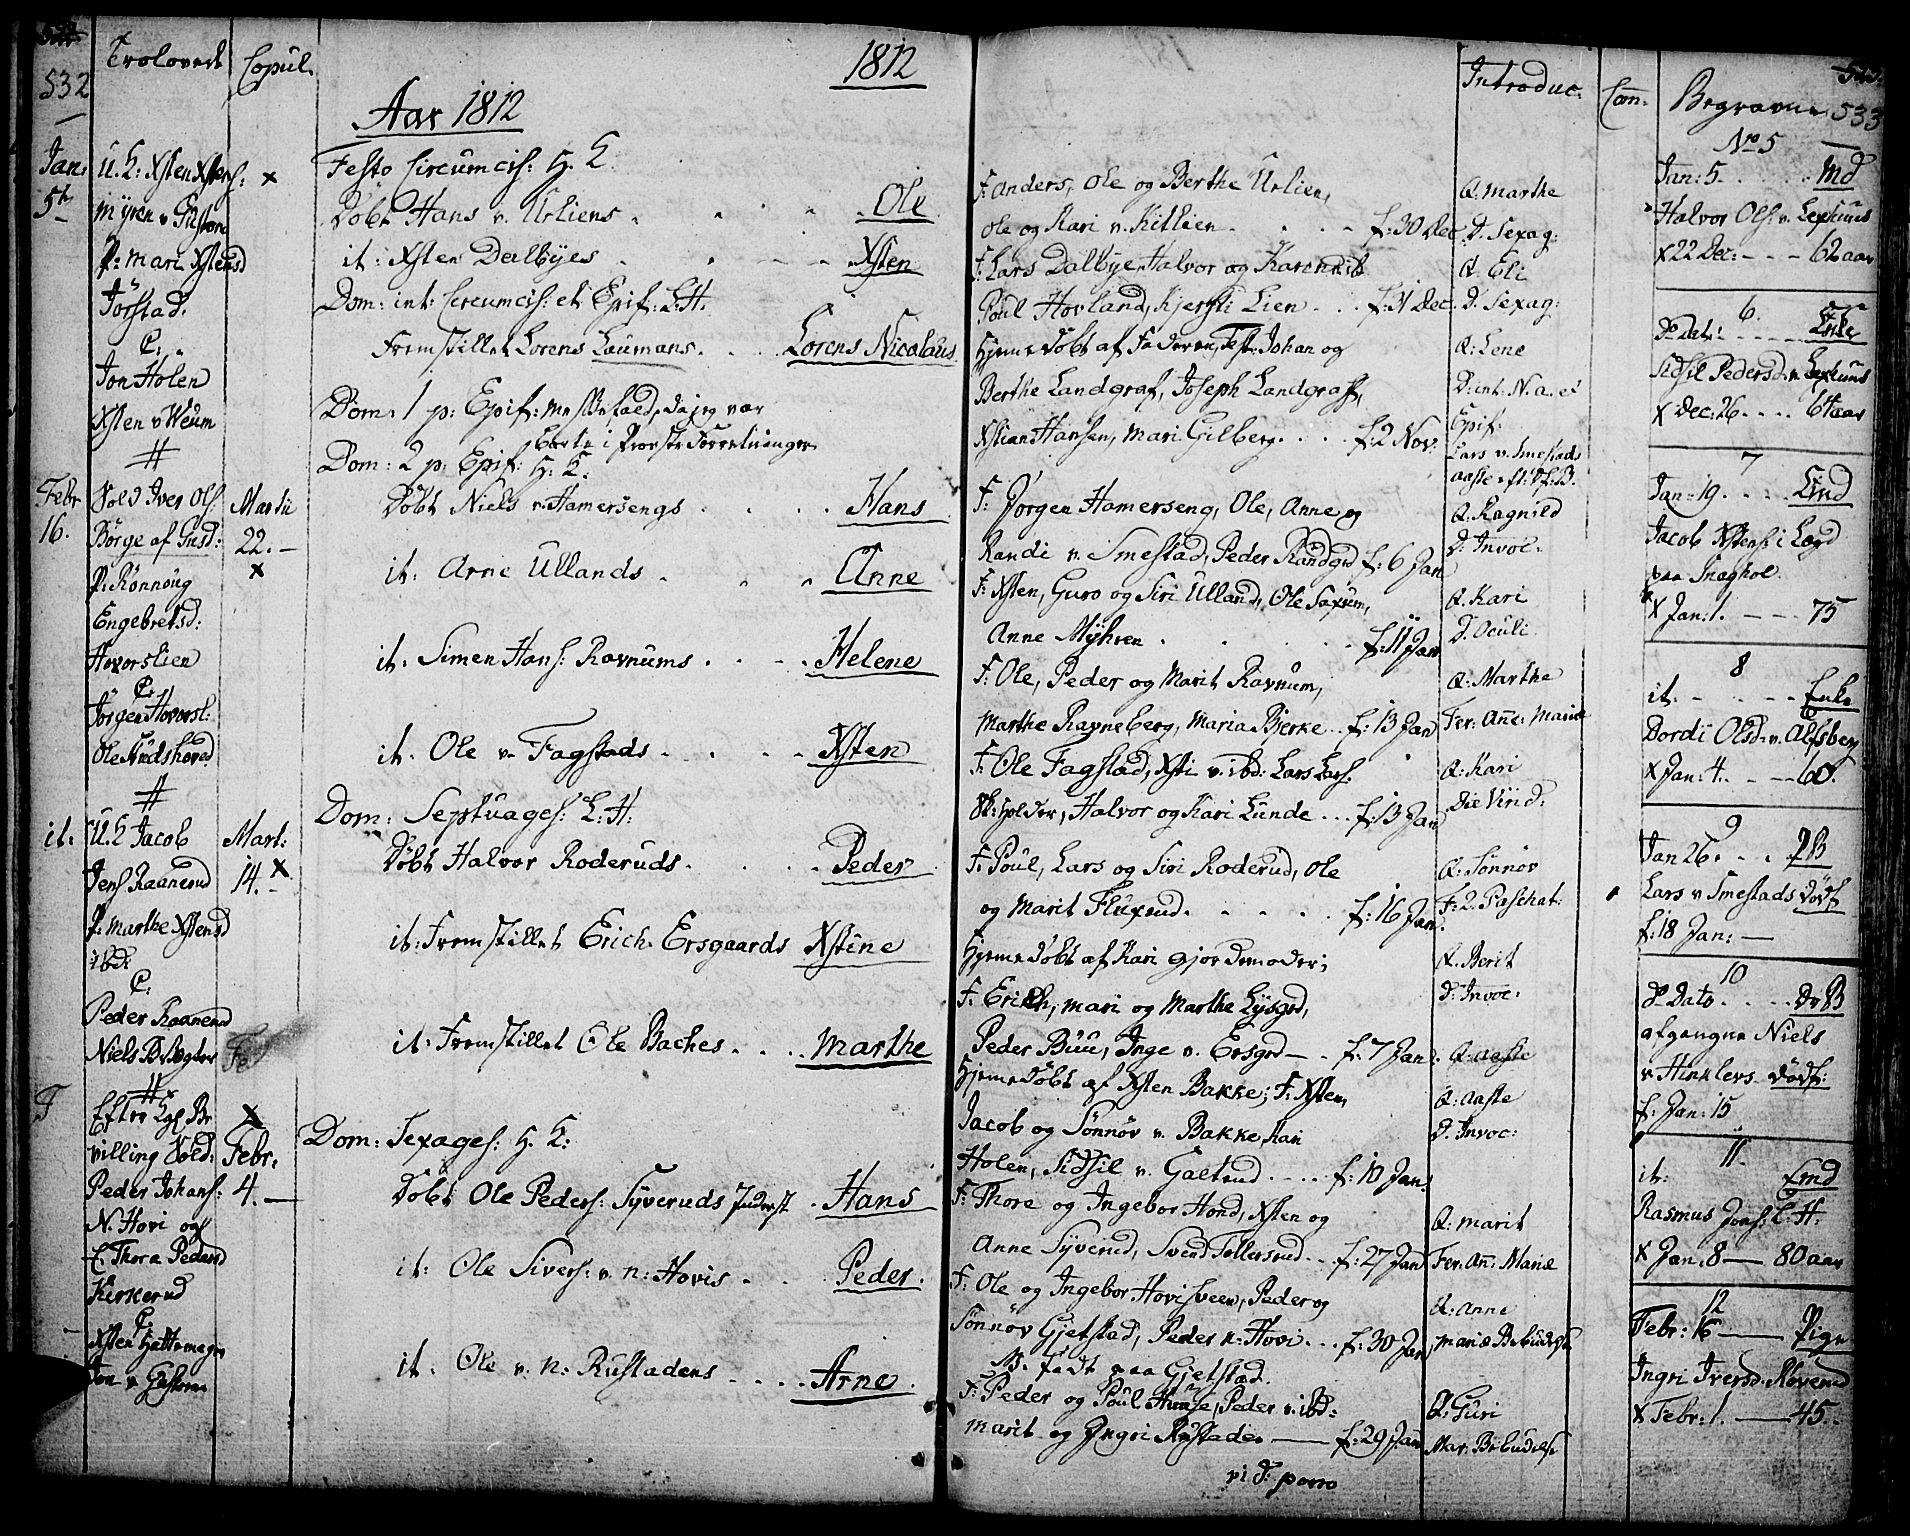 SAH, Fåberg prestekontor, Ministerialbok nr. 2, 1775-1818, s. 532-533